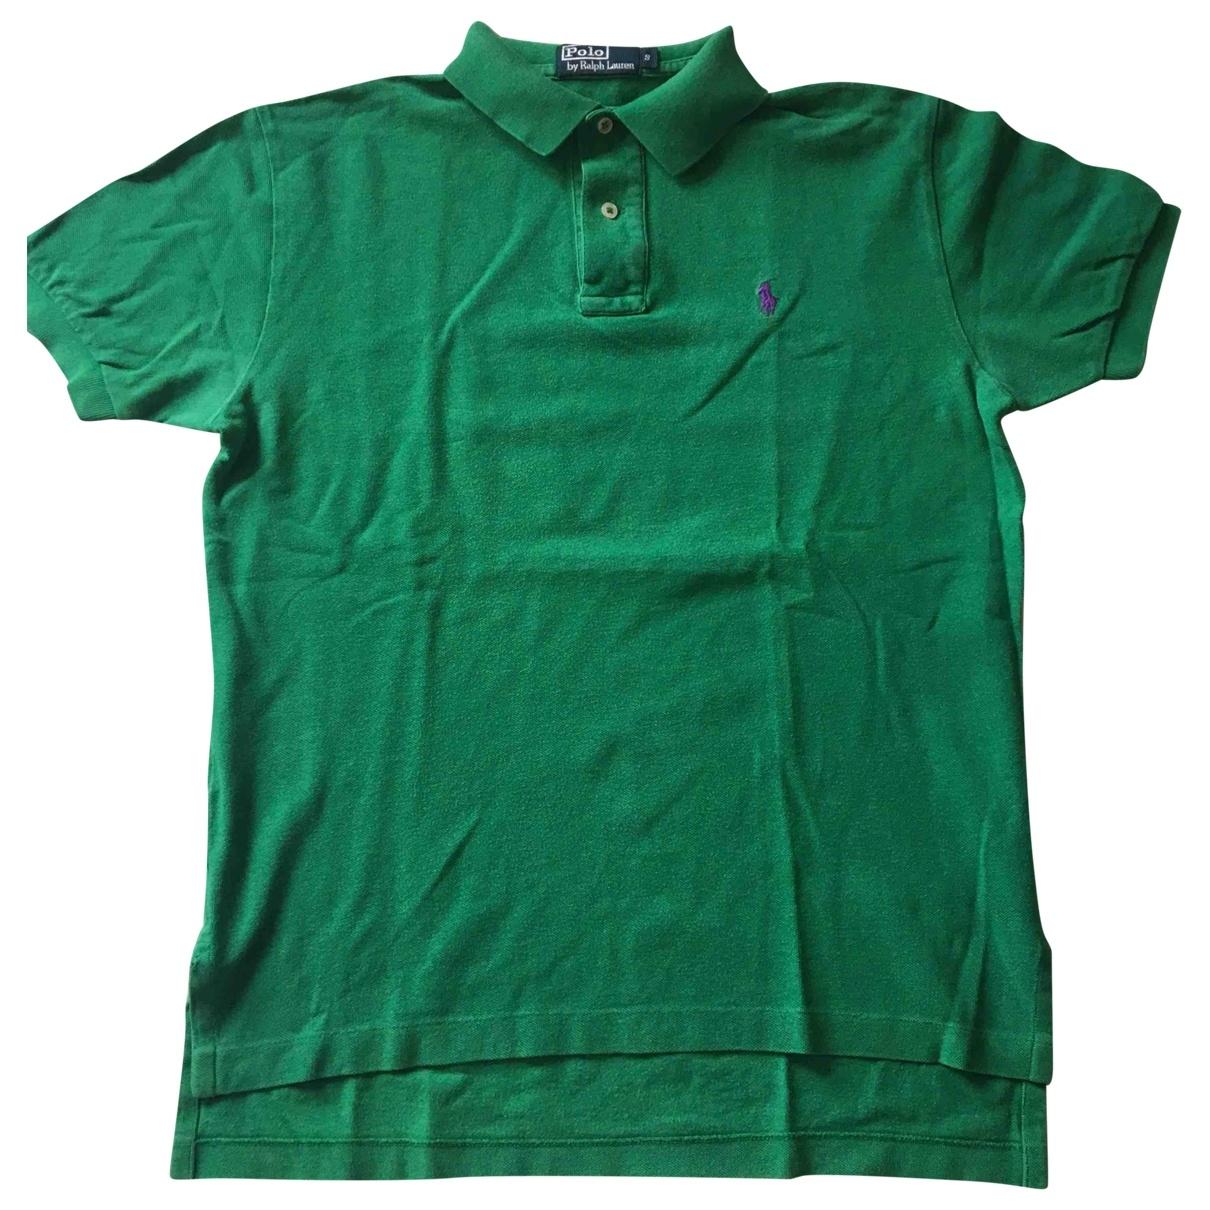 Polo Ralph Lauren \N Green Cotton Polo shirts for Men S International